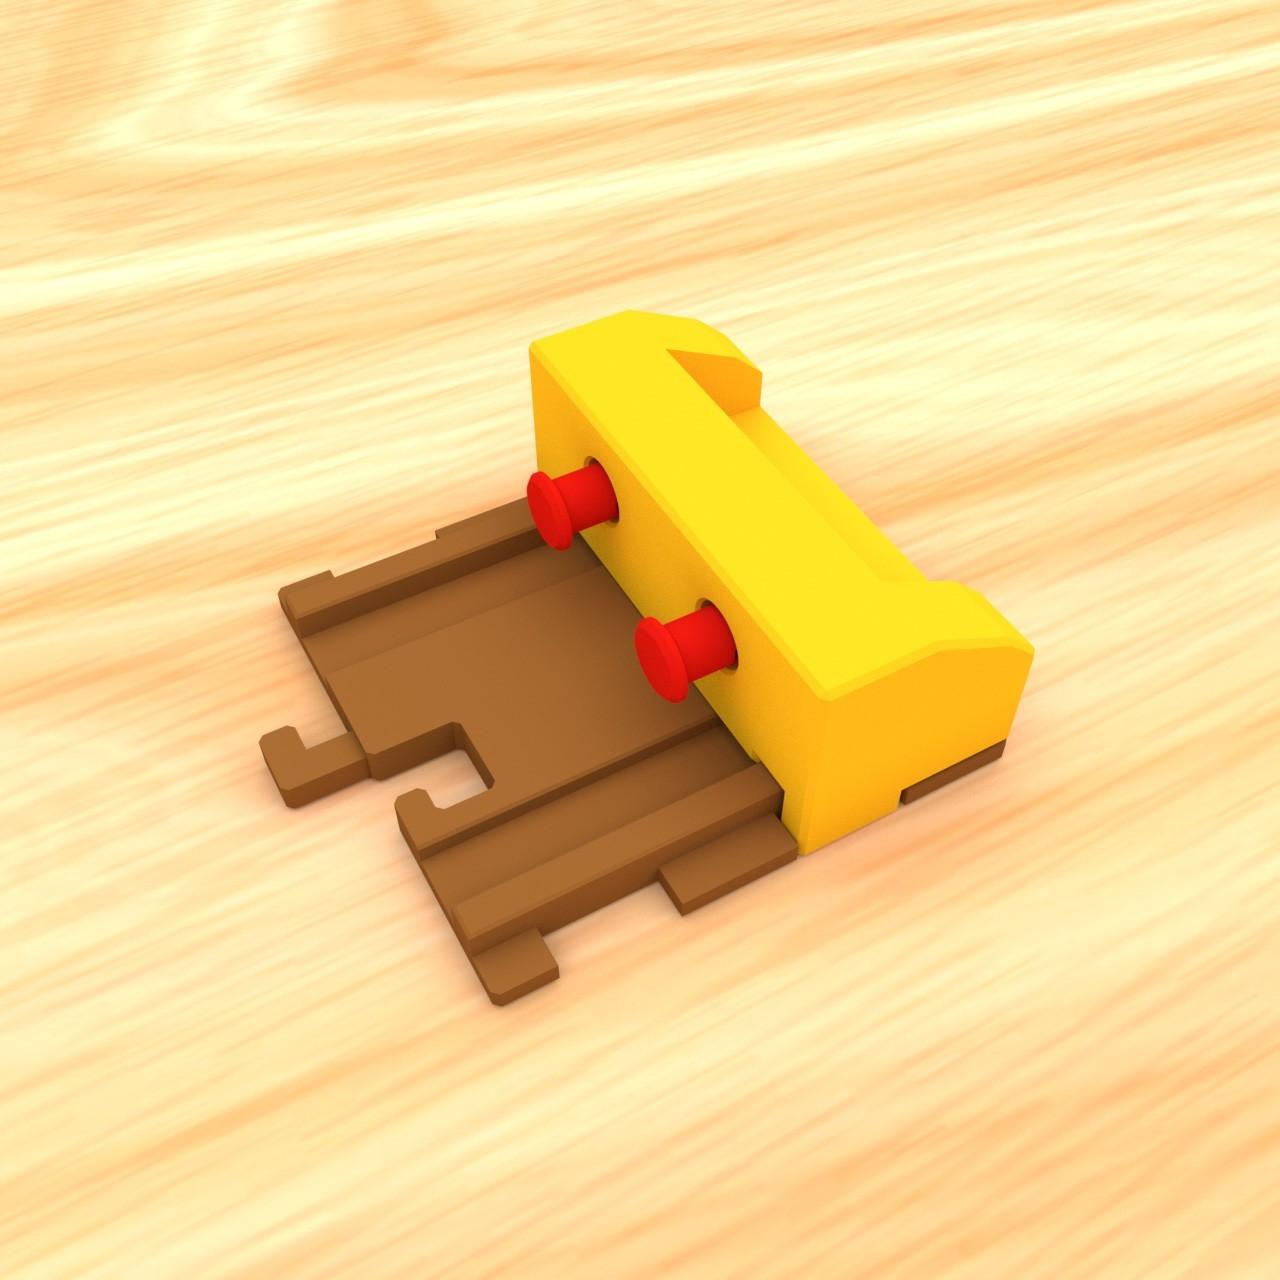 smalltoys-trainEndBumper02.jpg Download STL file SmallToys - Railways - Bumper stop • 3D printable model, Wabby